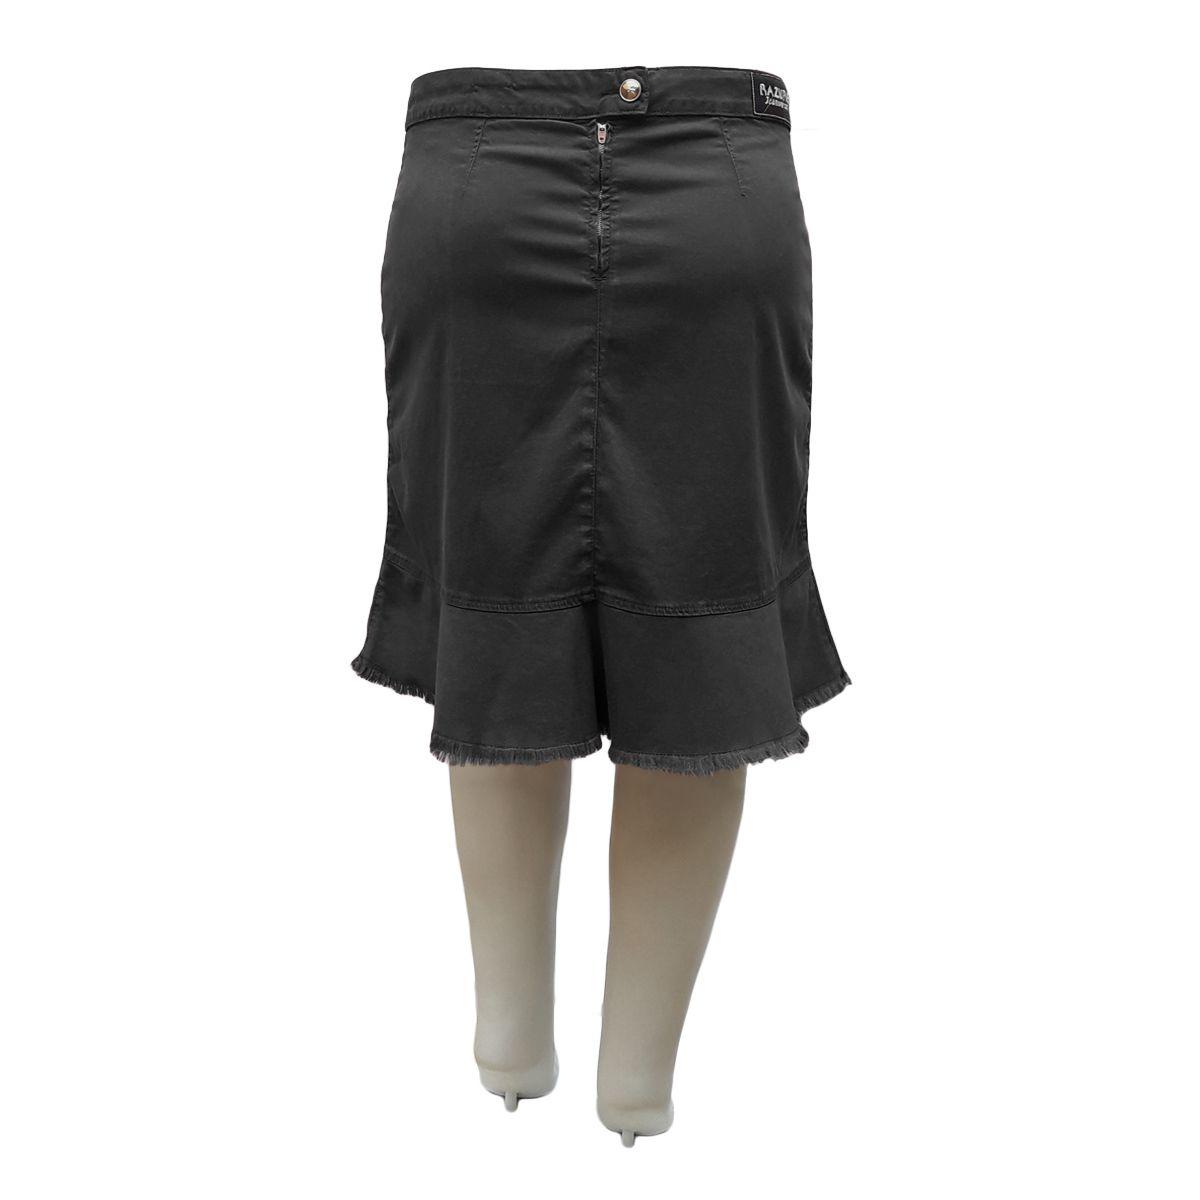 Saia Jeans Liocel Evangélica Transpassada Plus Size Preta